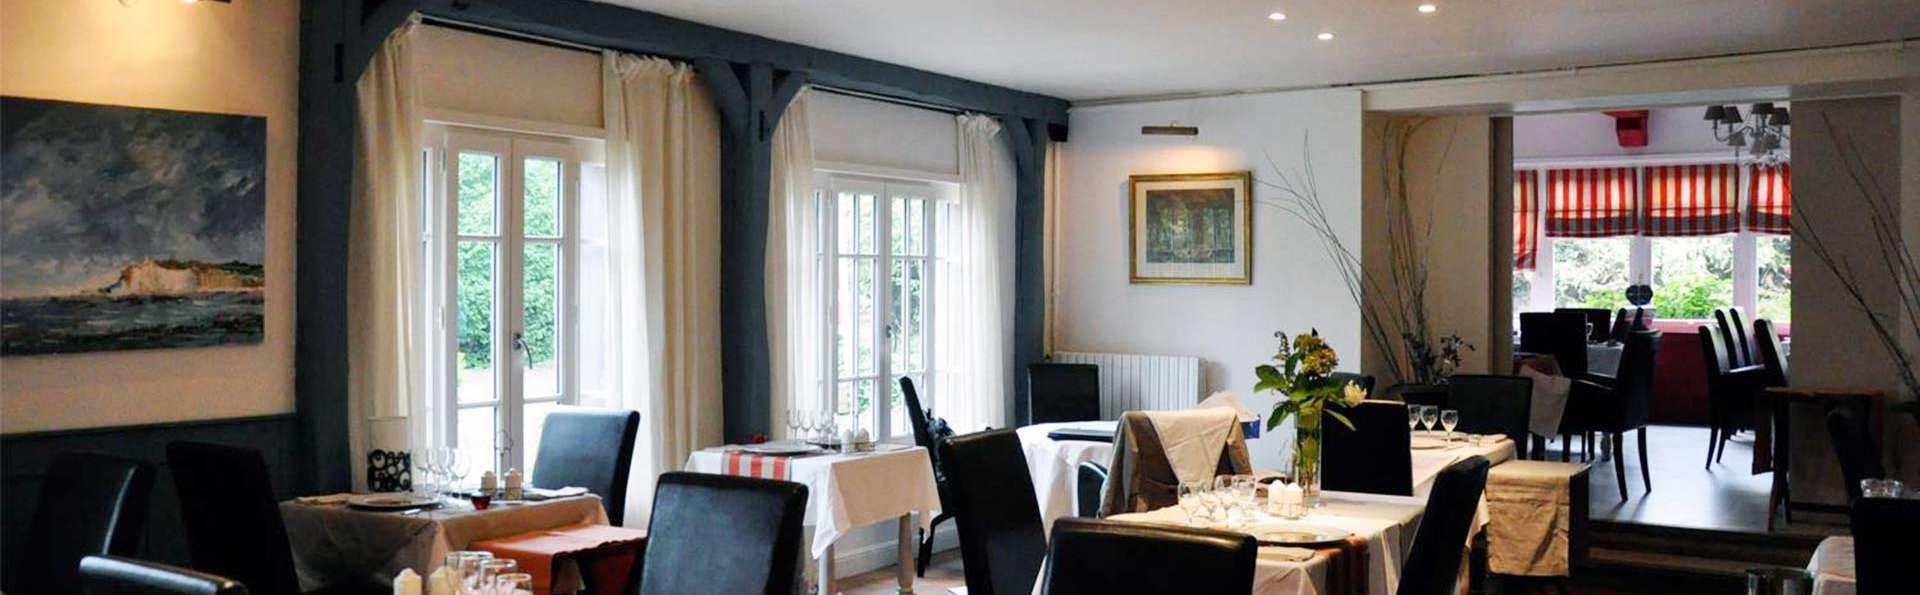 Hôtel Bellevue - Mers les Bains - EDIT_restaurant1.jpg